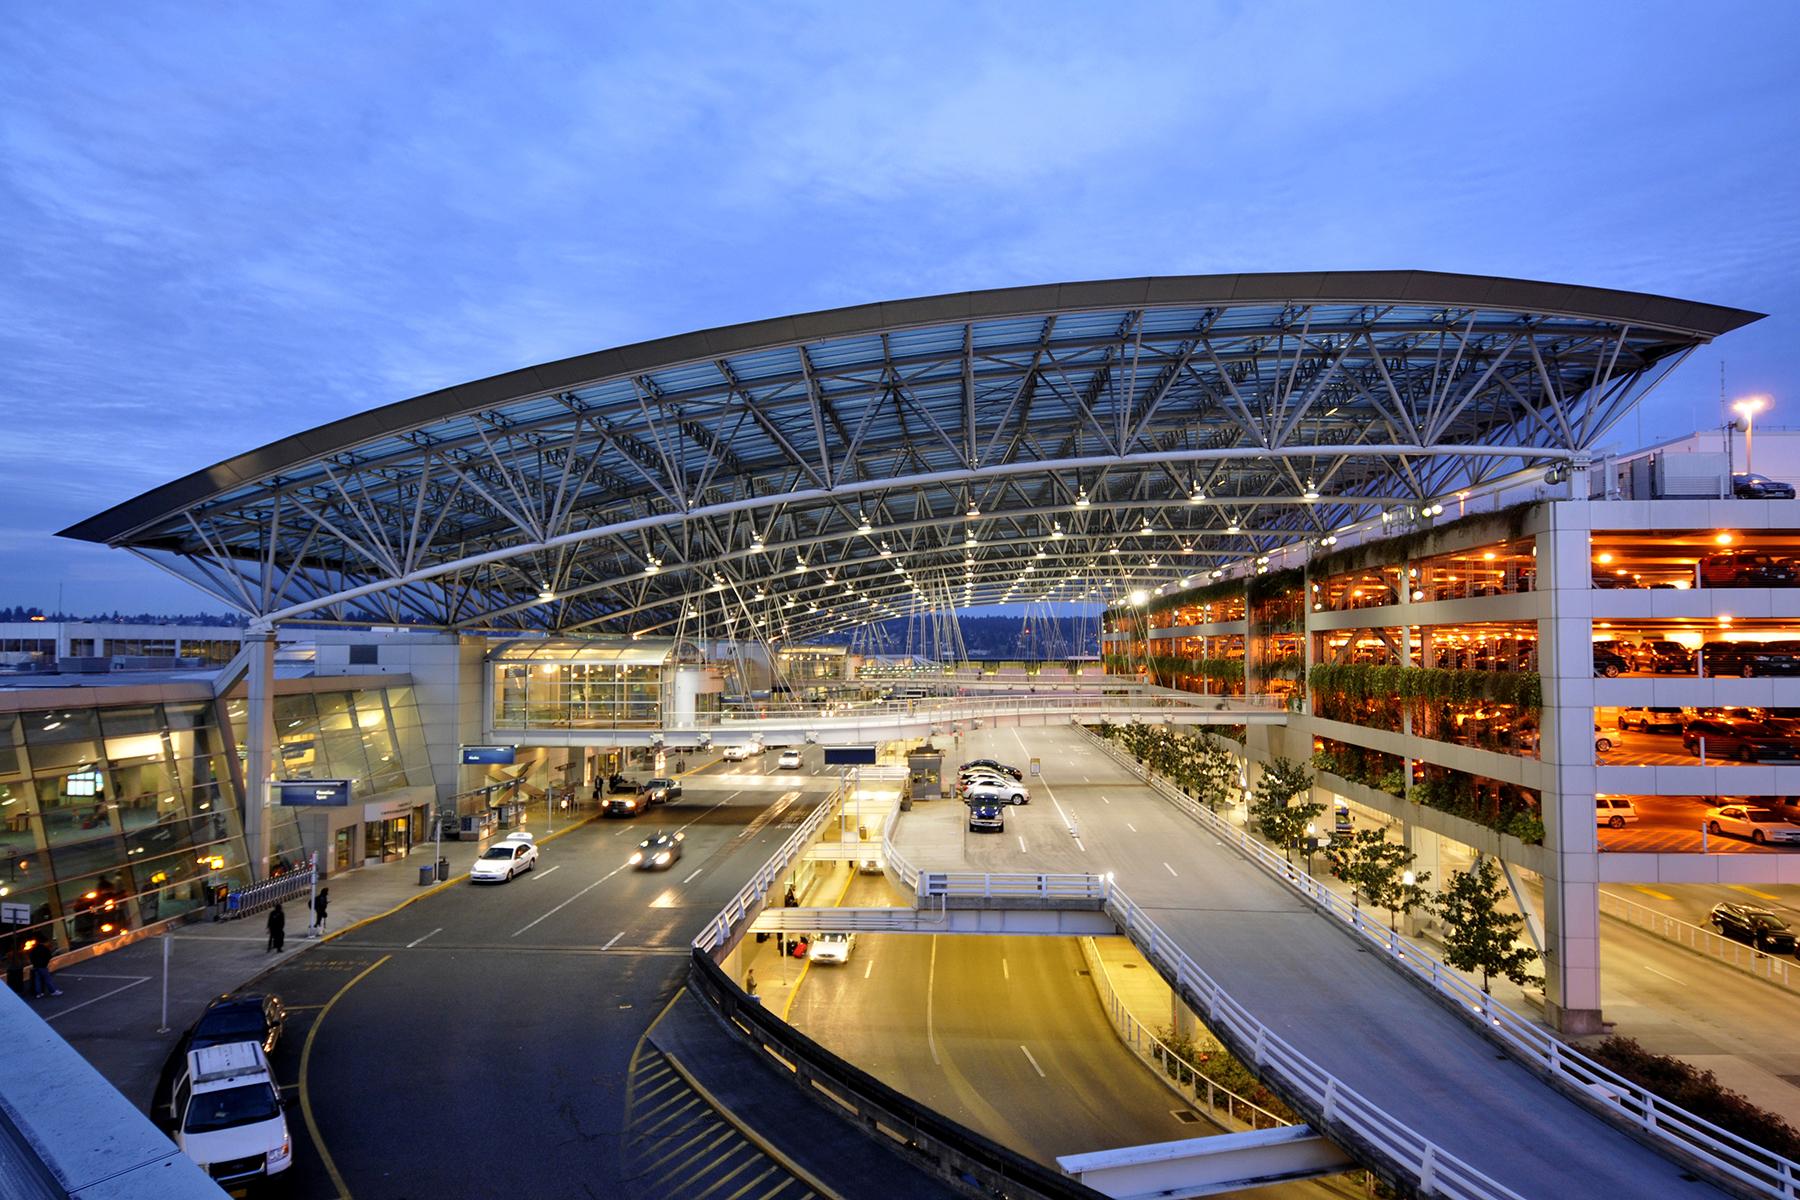 No. 1 Domestic: Portland International Airport, Oregon